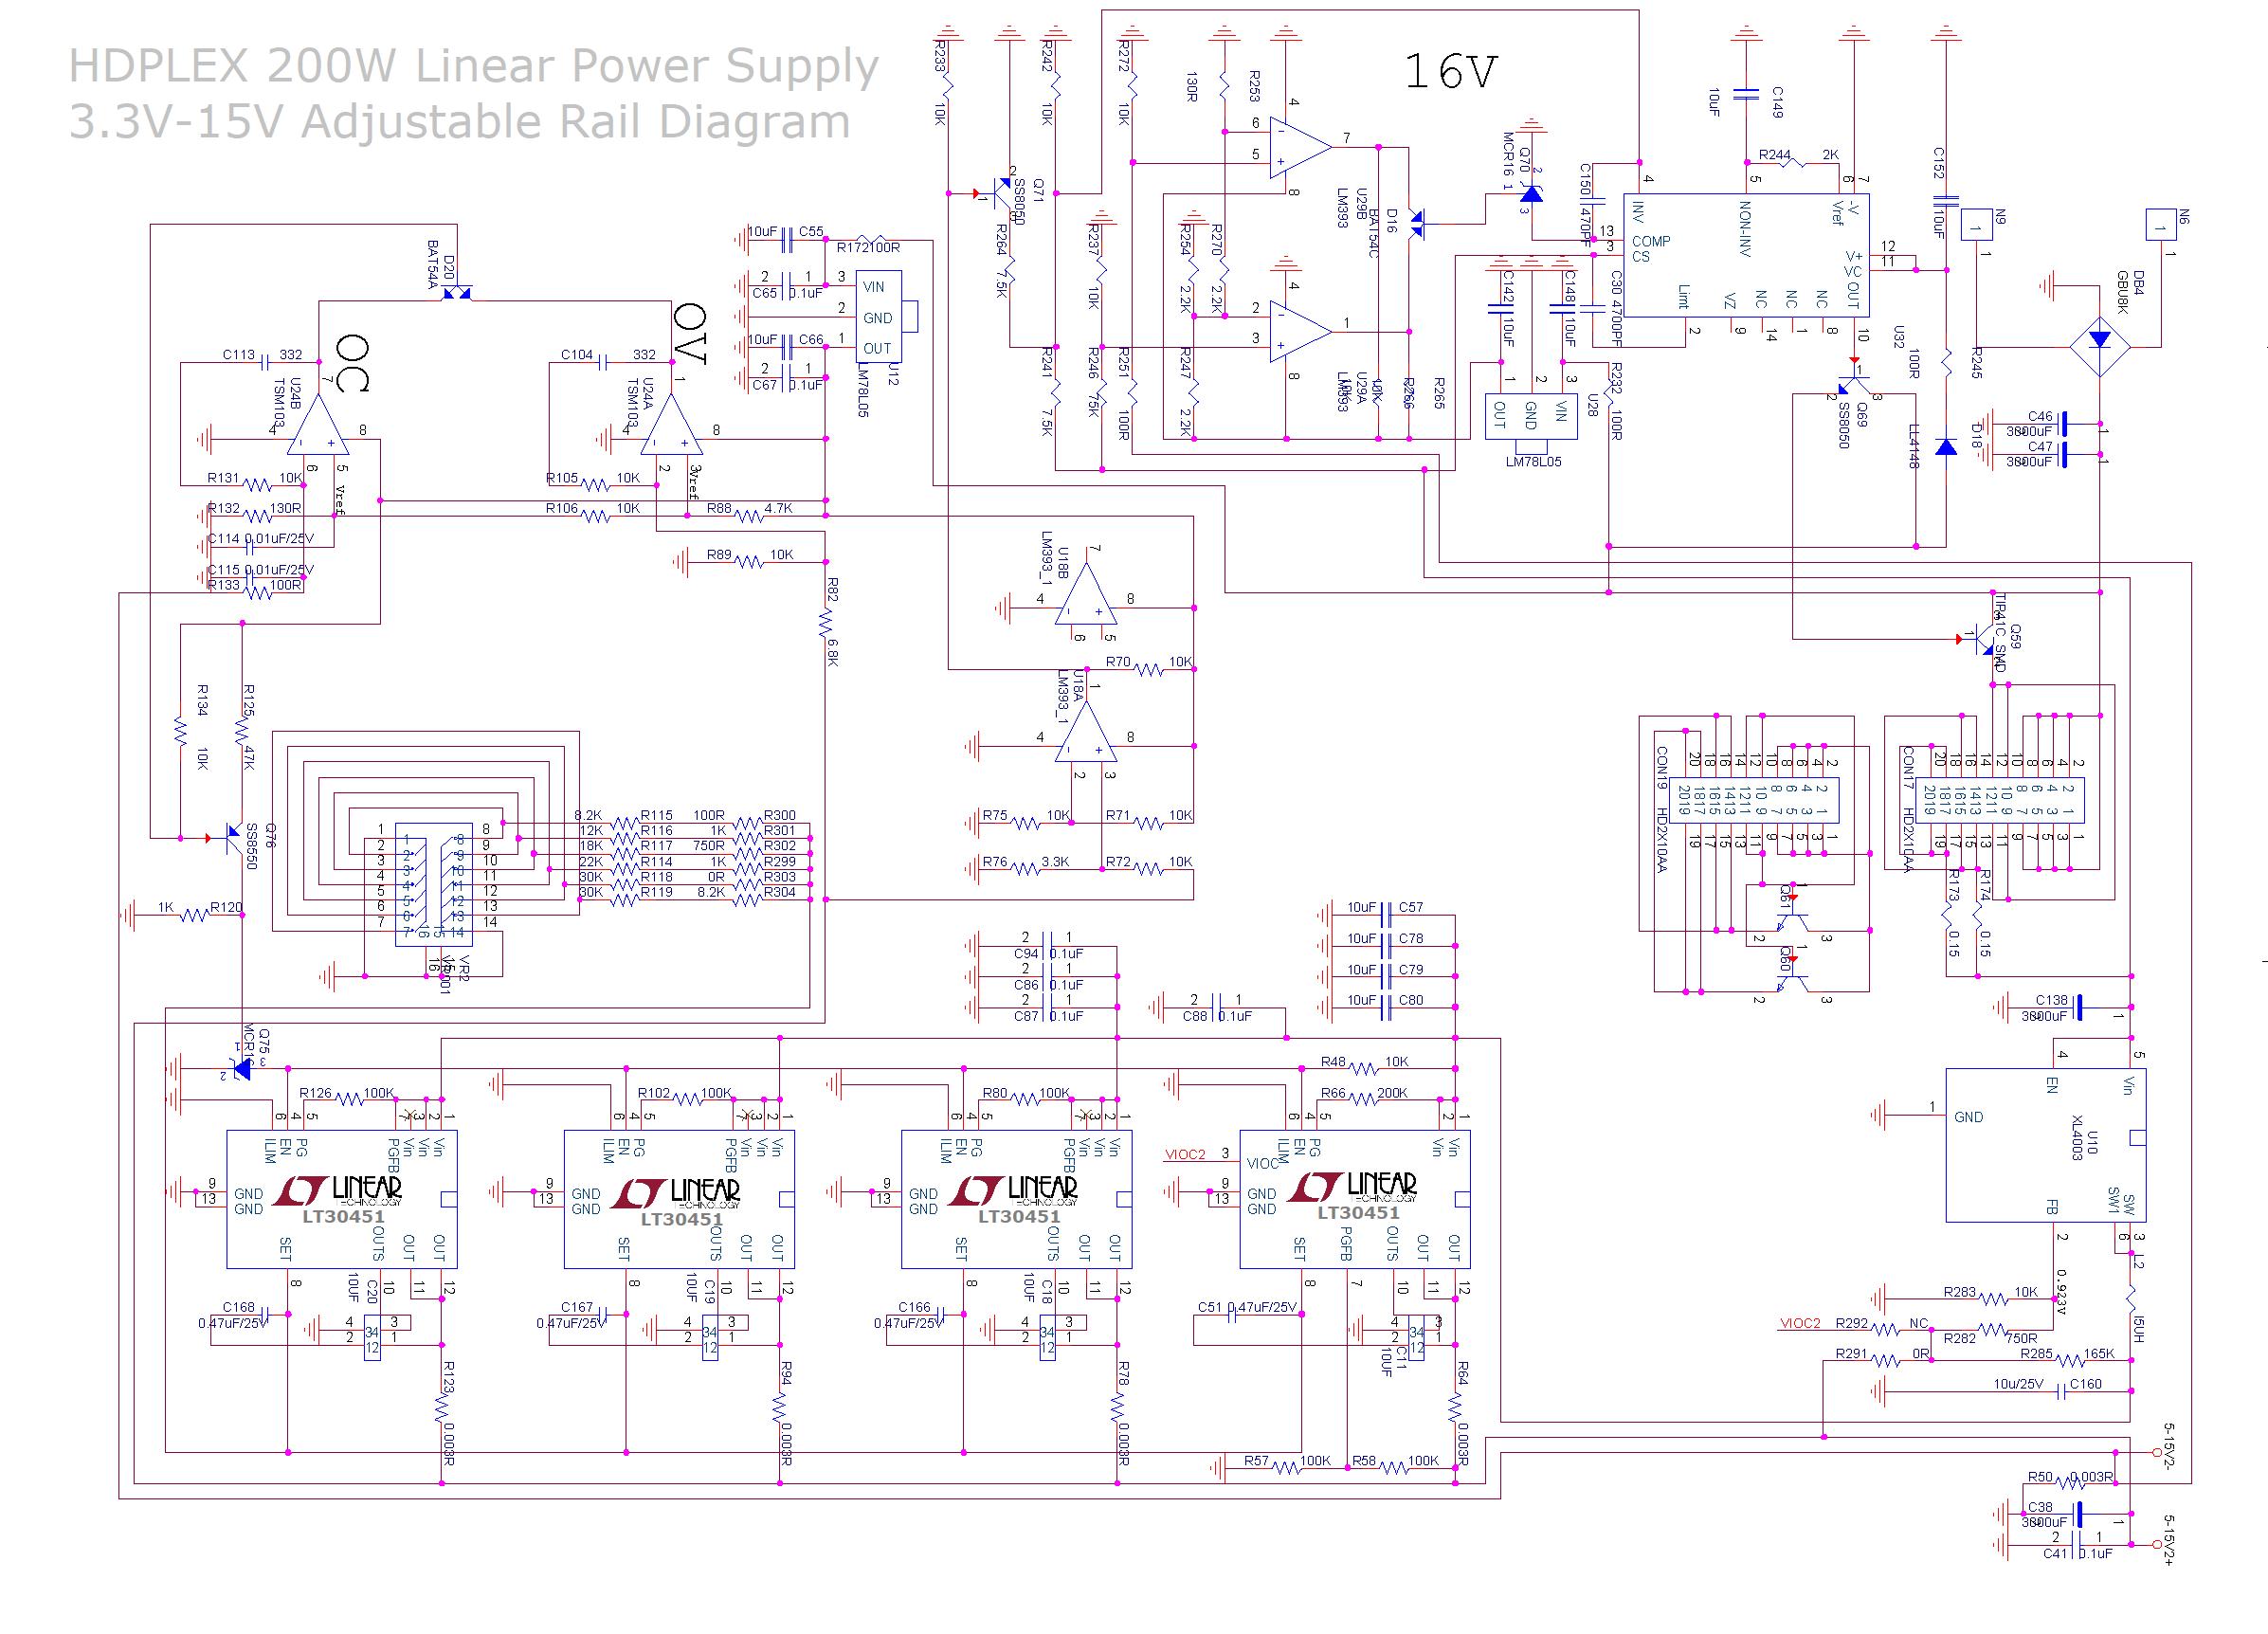 Hdplex 200w Linear Power Supply Multi Rail Output Dc Regulator 15v Non Transformer Psu Diagram